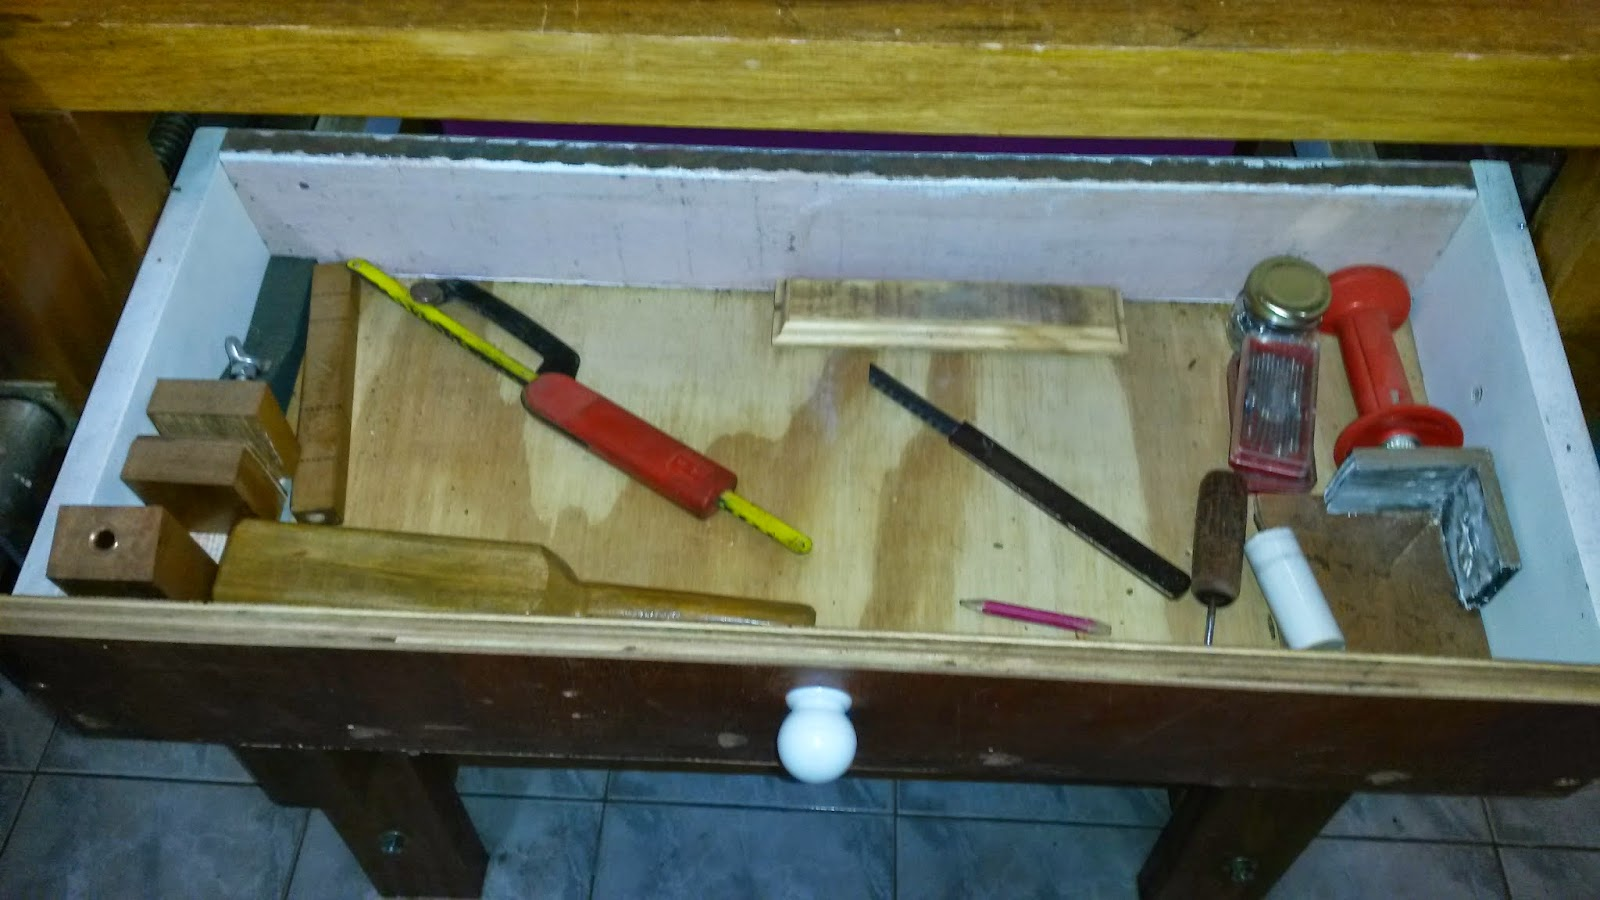 Aqui eu guardo as ferramentas que eu mesmo construí . mini torno  #694118 1600x900